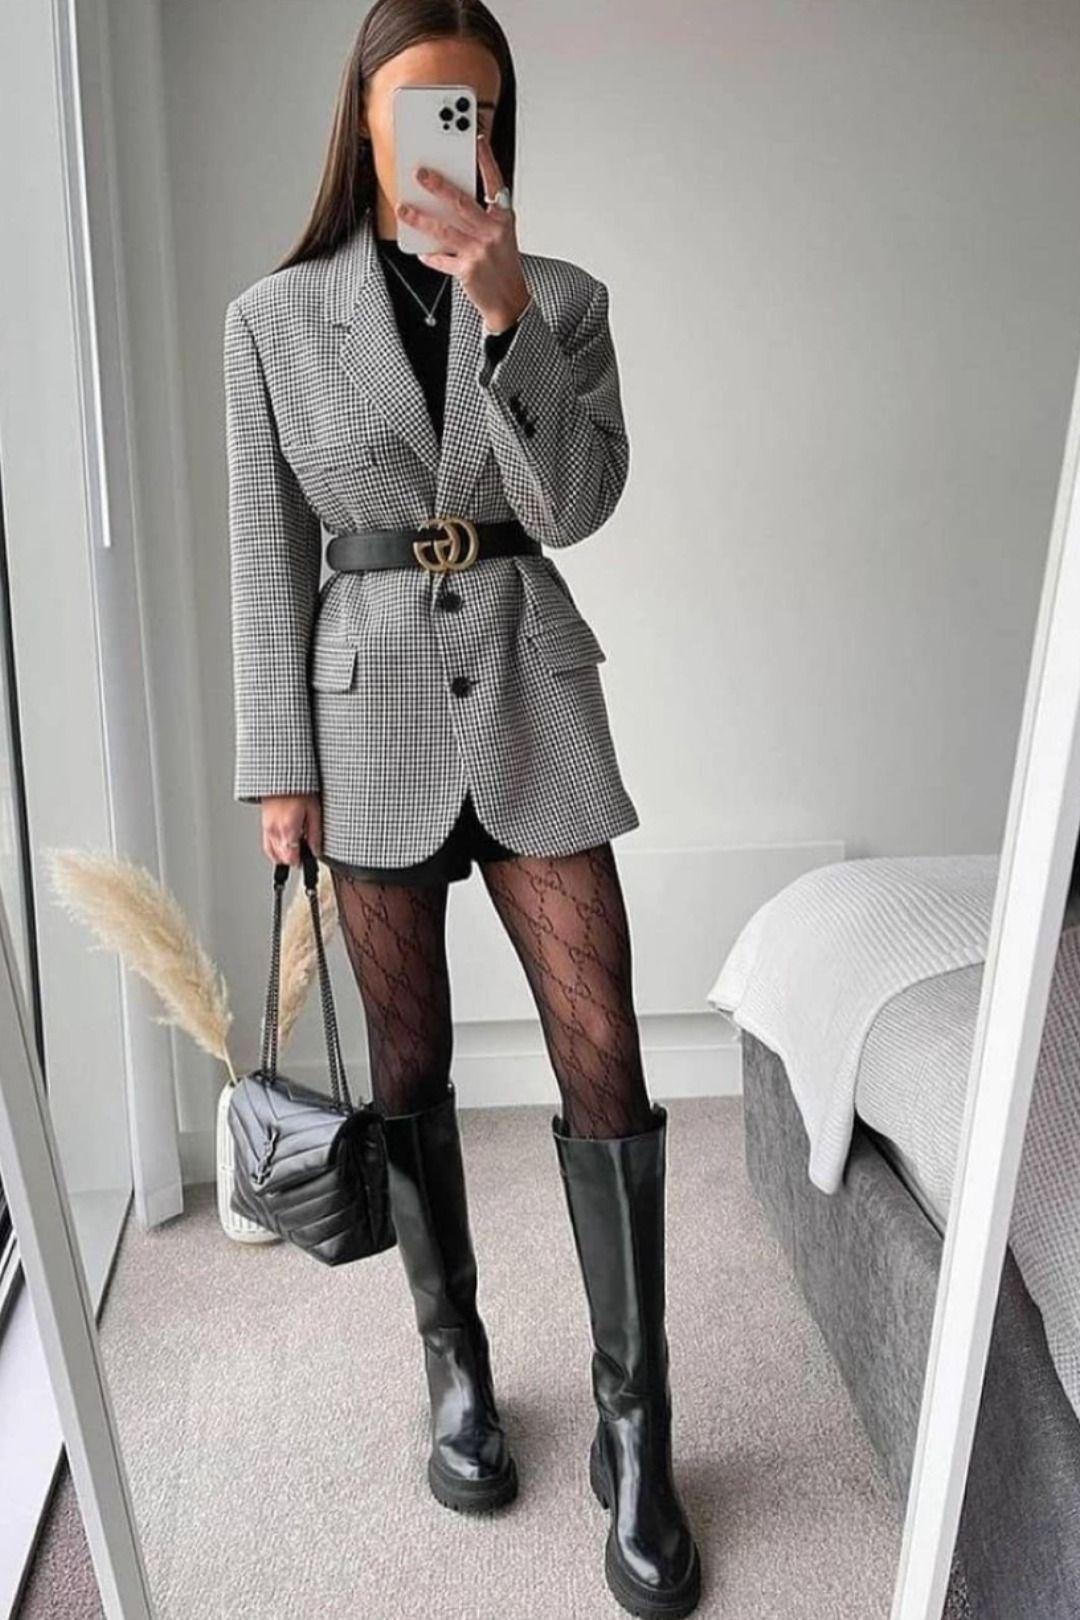 20 AFFORDABLE YESSTYLE CLOTHING PICKS [JANUARY 2021